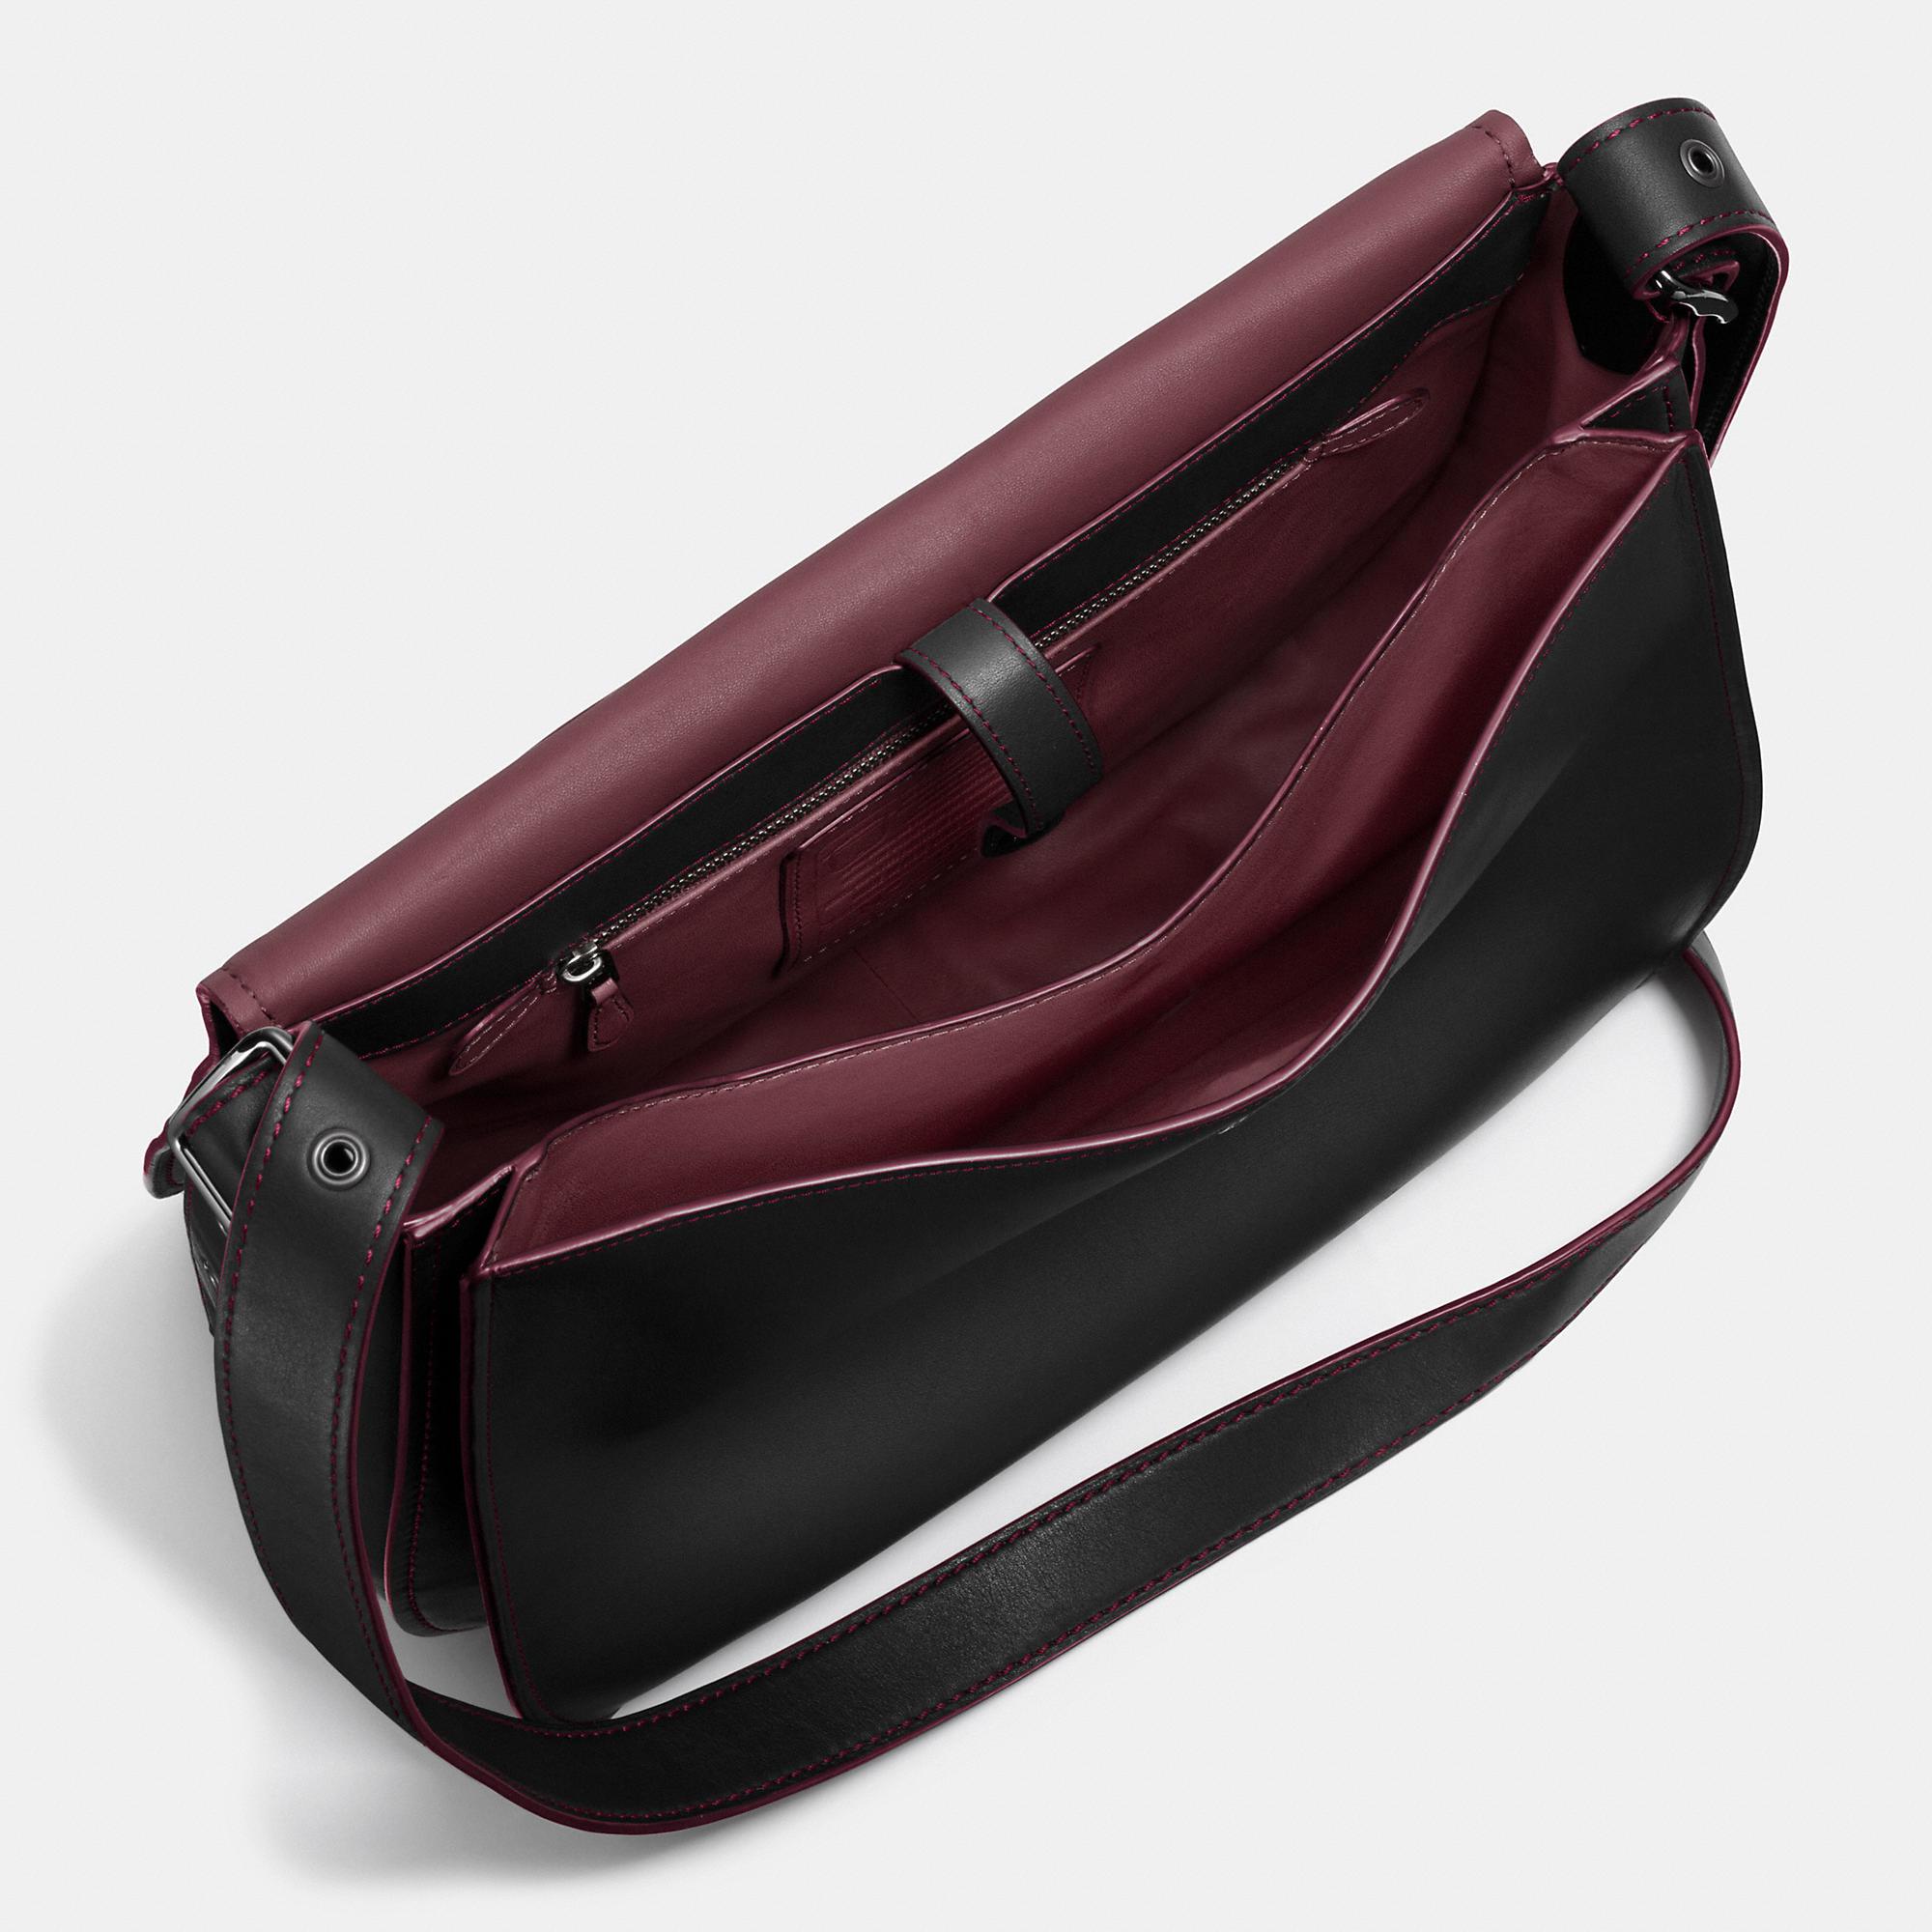 ec3da3f9b79 ... Lyst - Coach Saddle Bag 35 In Glovetanned Leather in Black official  photos 7f8fc 4b5f8 ...